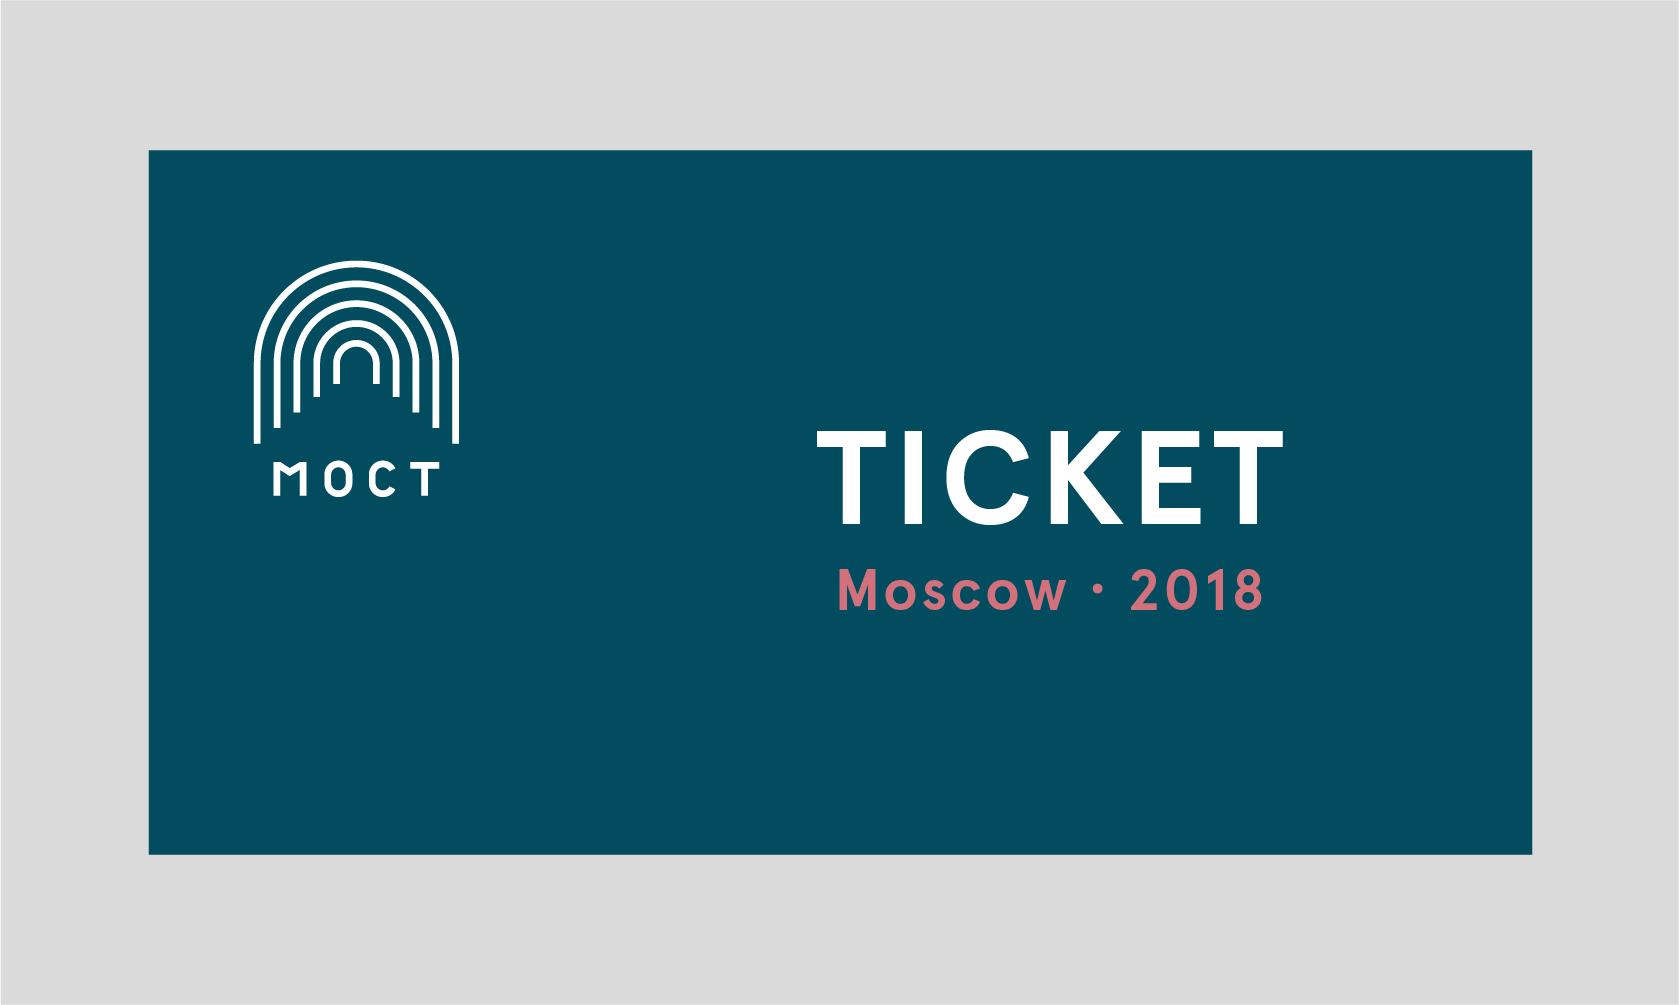 Icon_Ticket-02.jpg